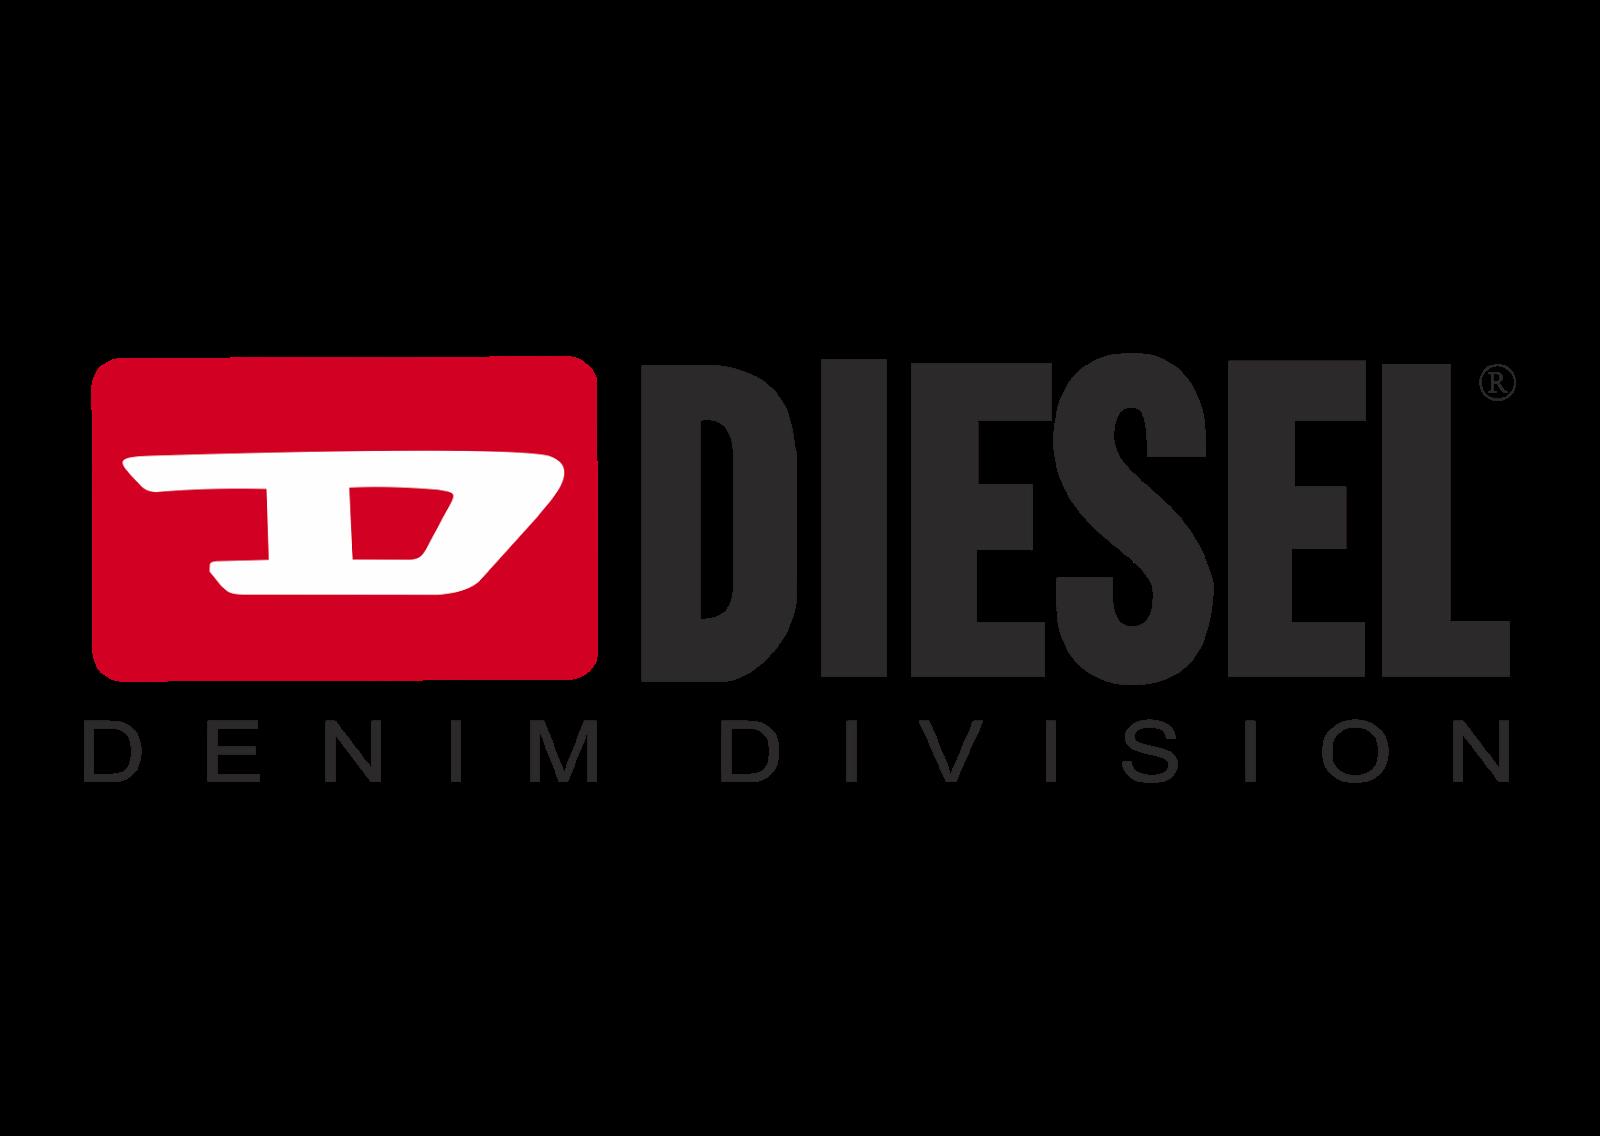 diesel denim division logo vector format cdr ai eps